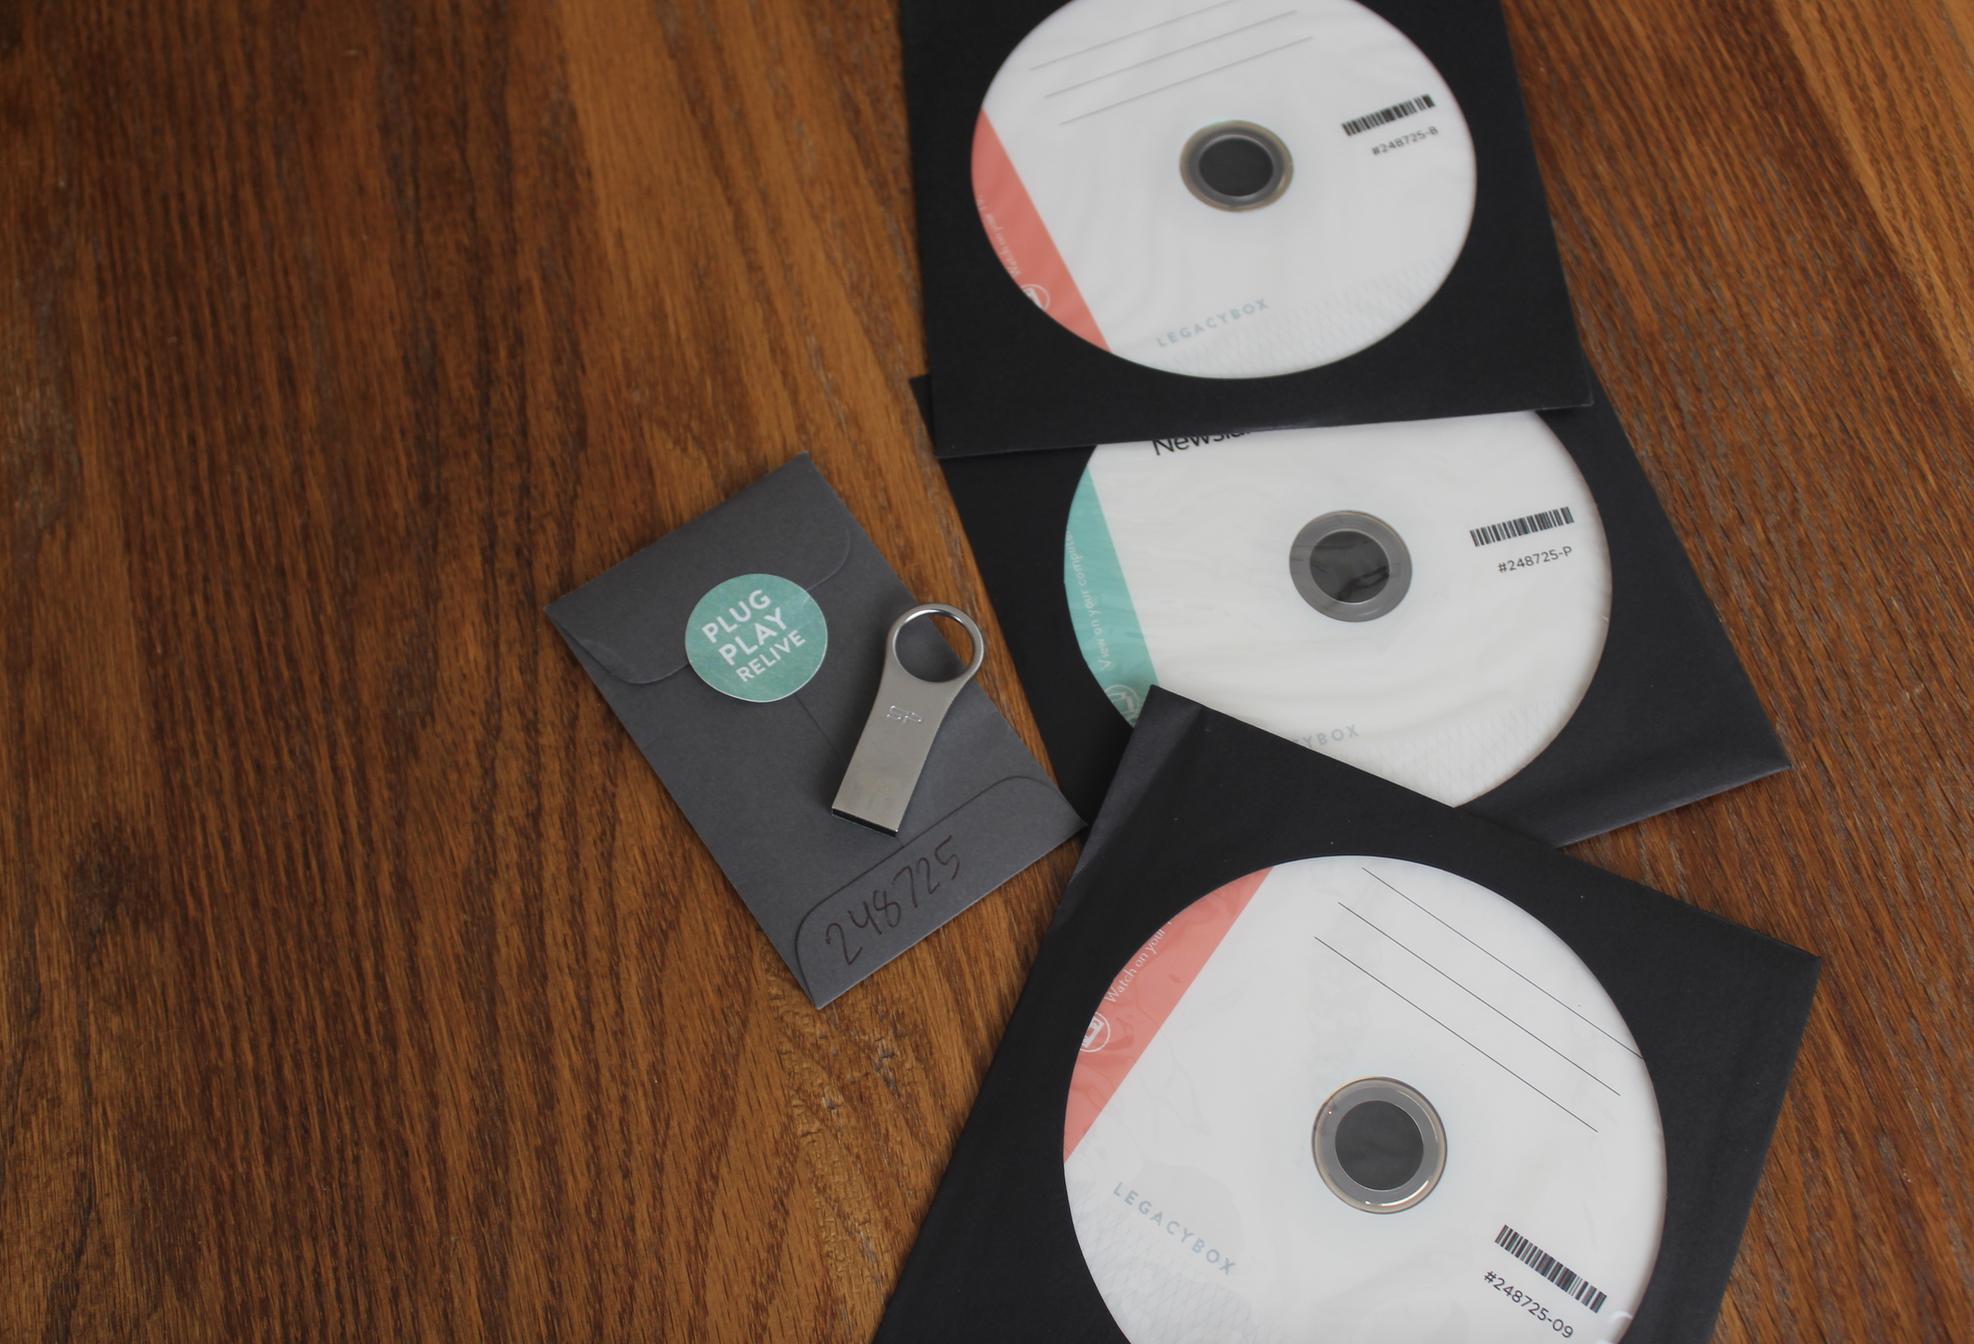 digitized Legacybox products